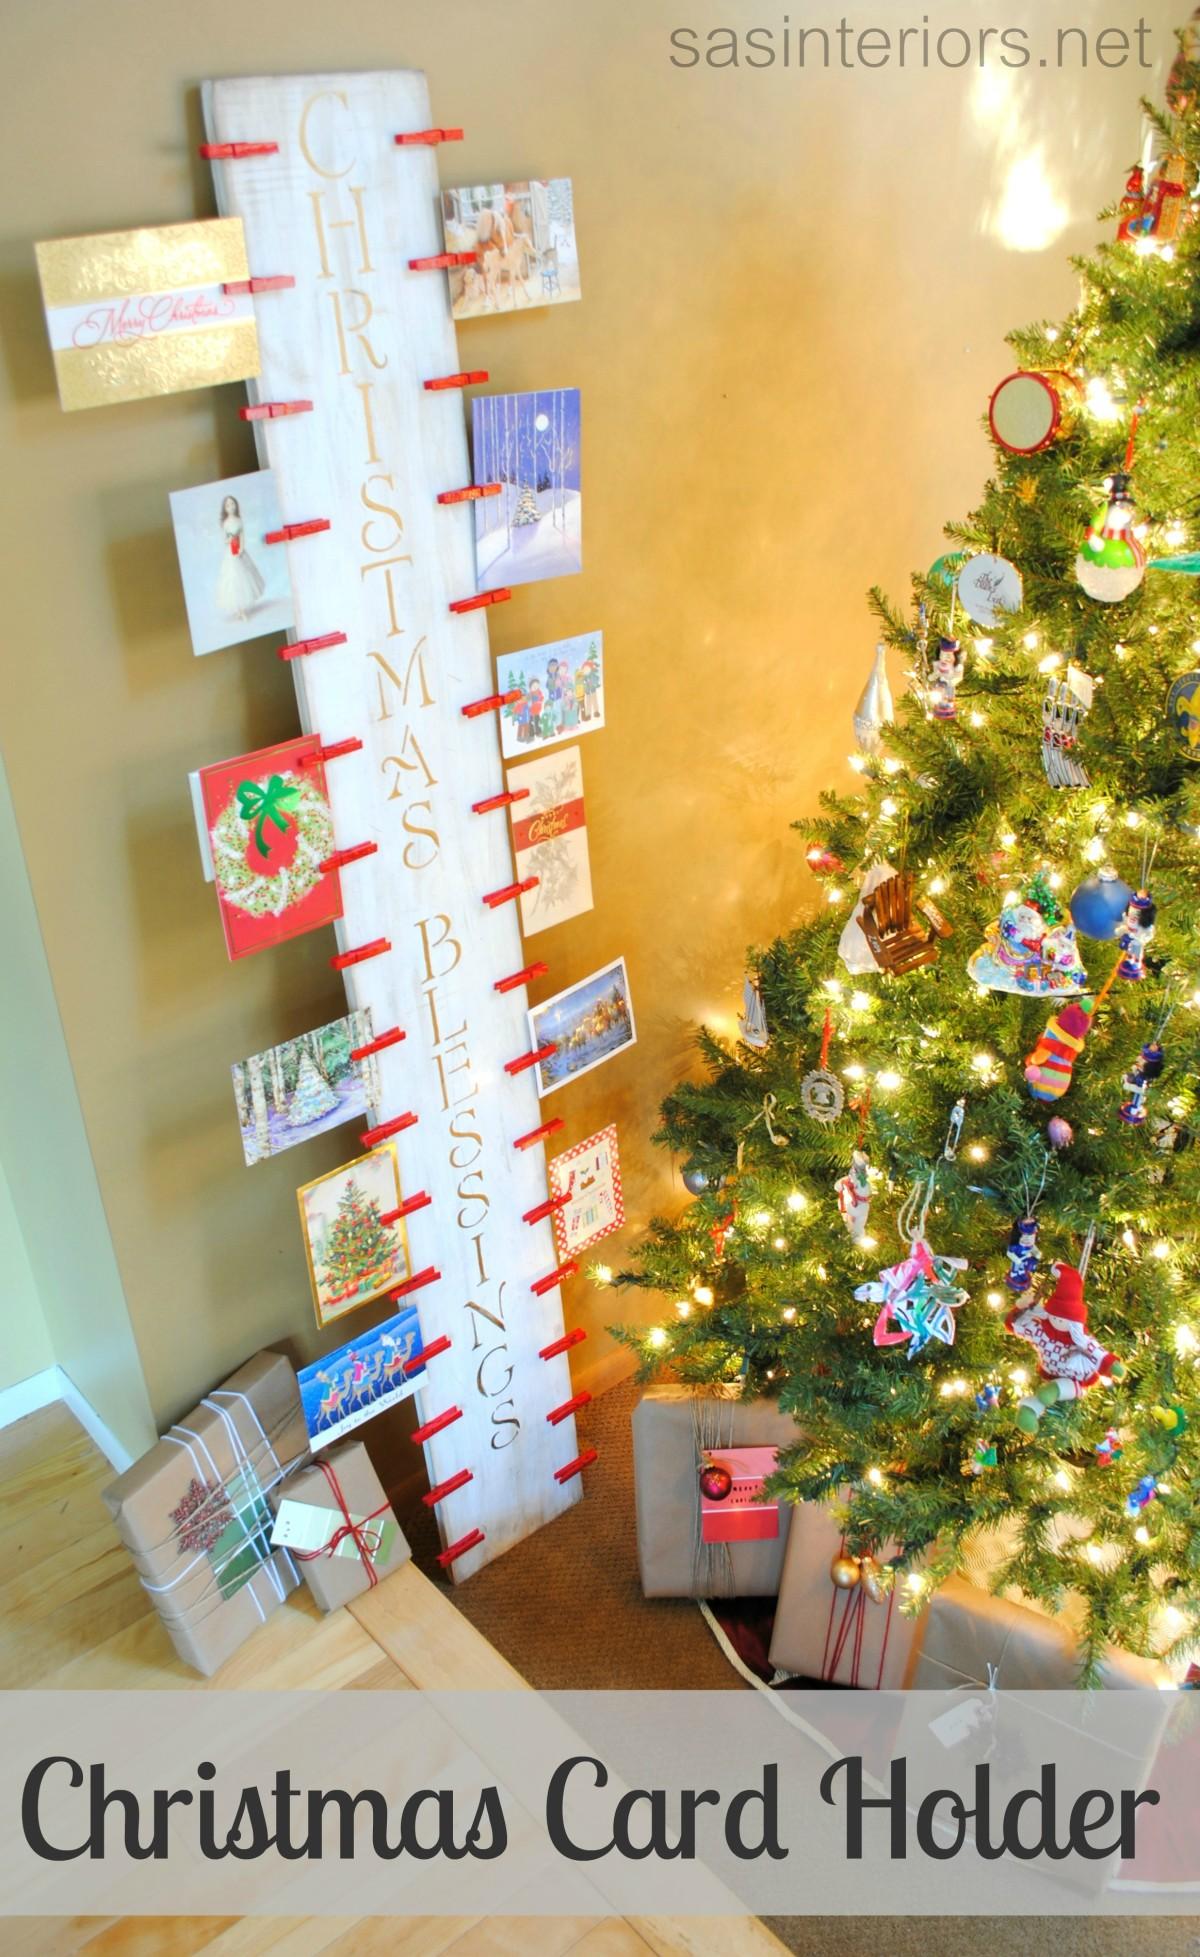 Christmas Card Holder A Lowes Creative Idea Lowescreator Jenna Burger Design Llc